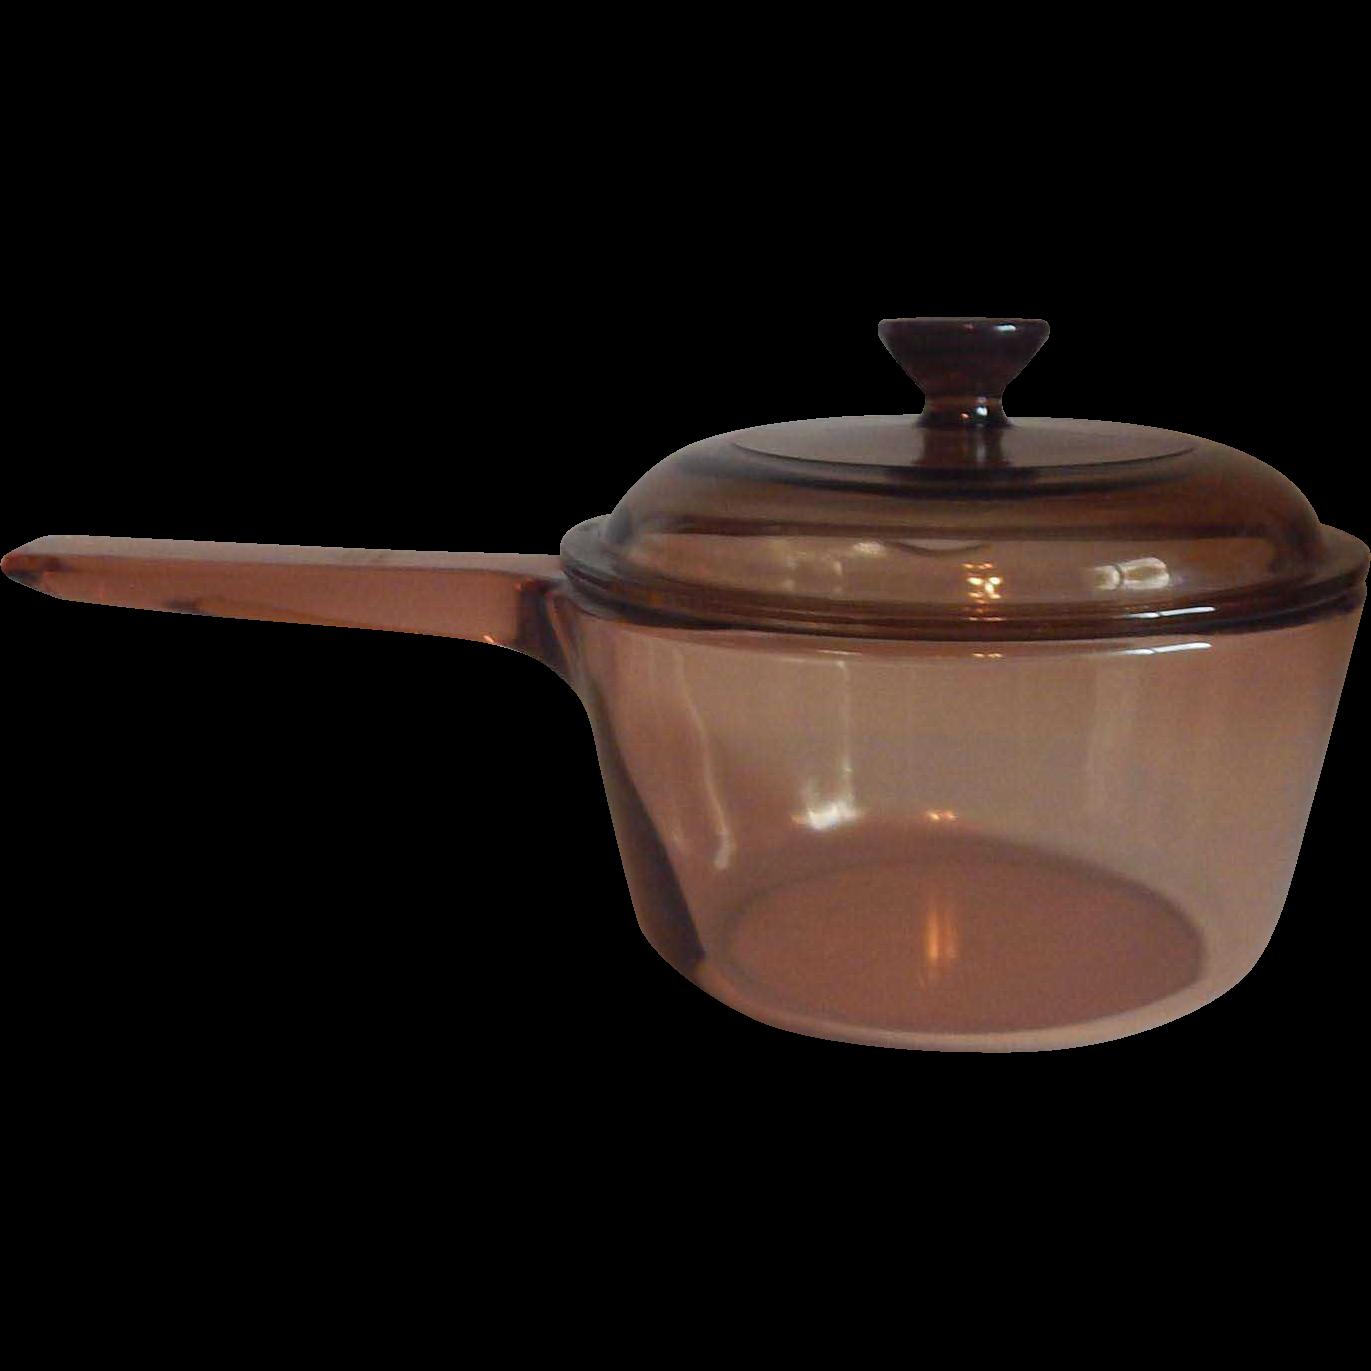 Corning Ware Amber Vision Saucepan